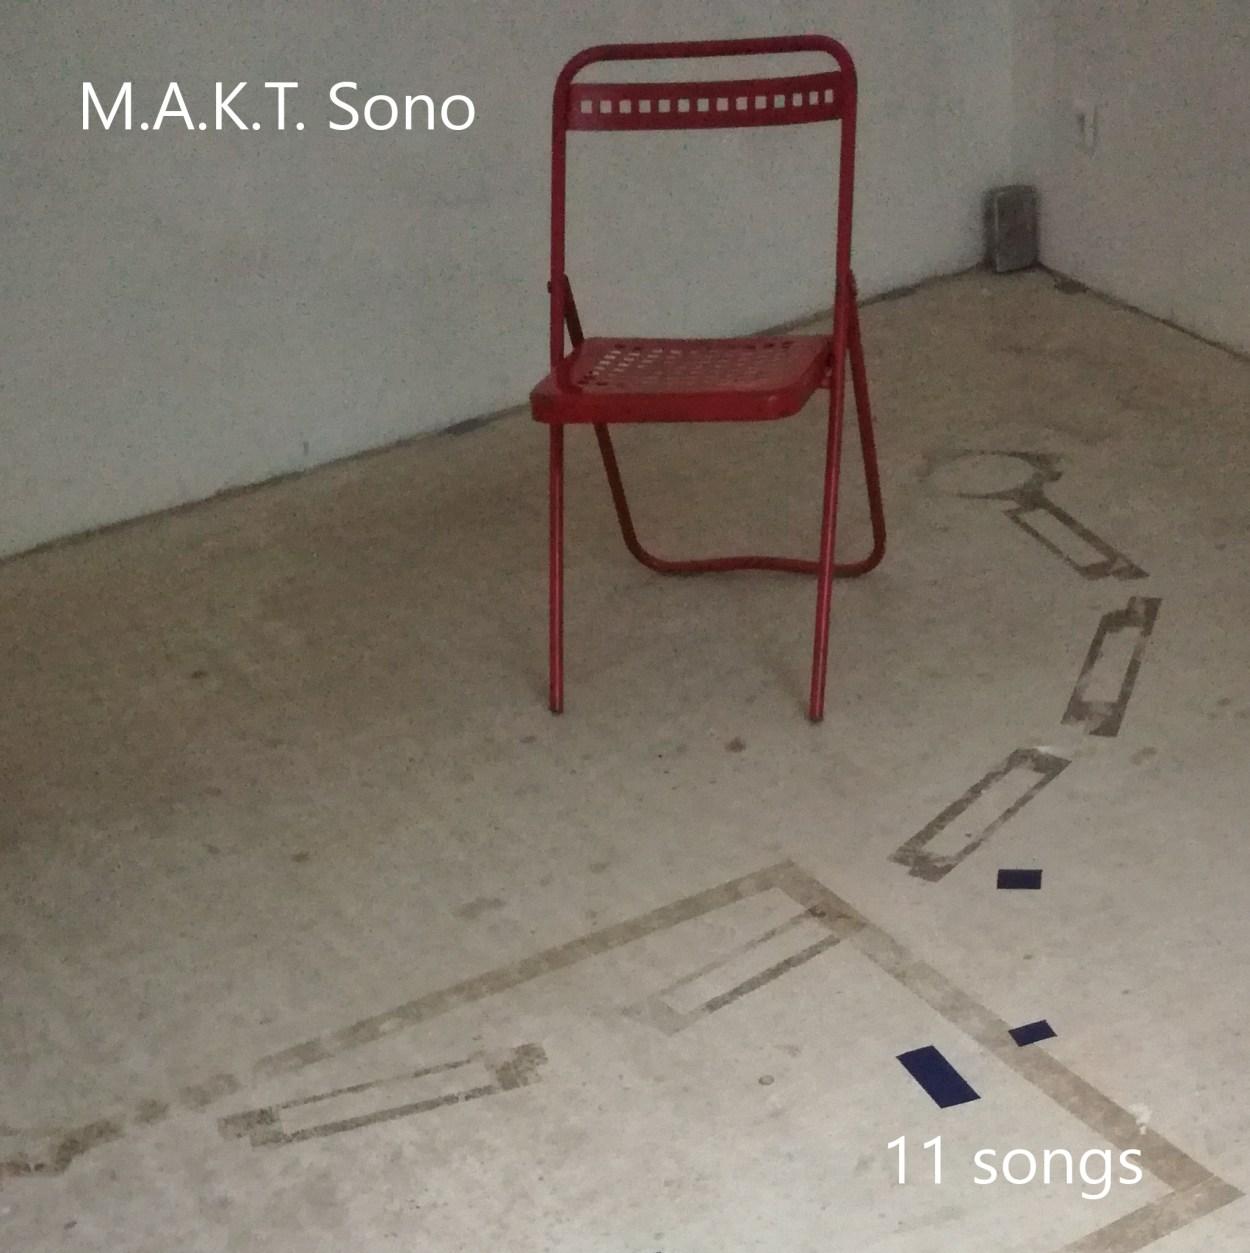 M.A.K.T. Sono – 11 Songs